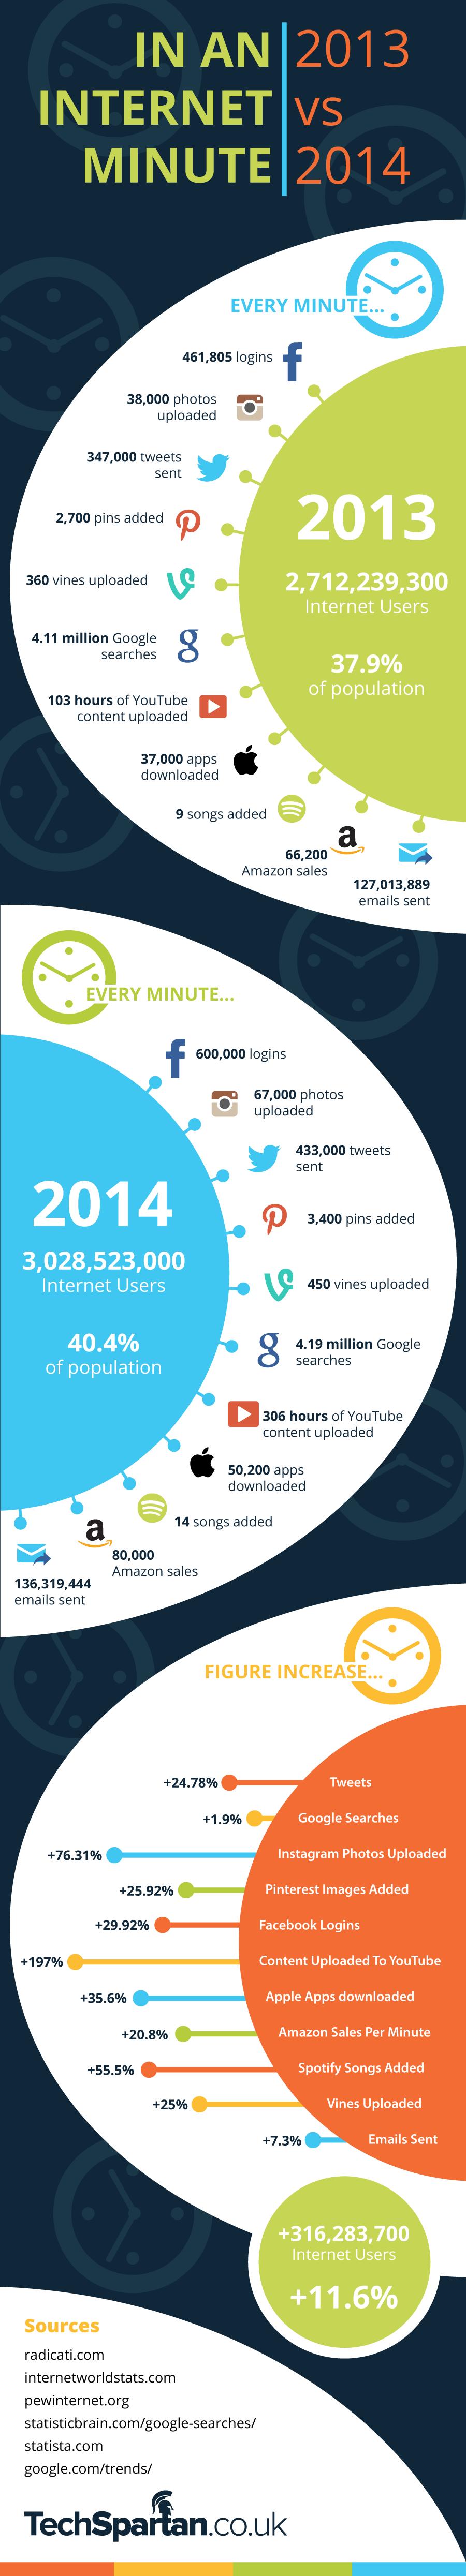 In An Internet Minute – 2013 VS 2014 by TechSpartan.co.uk